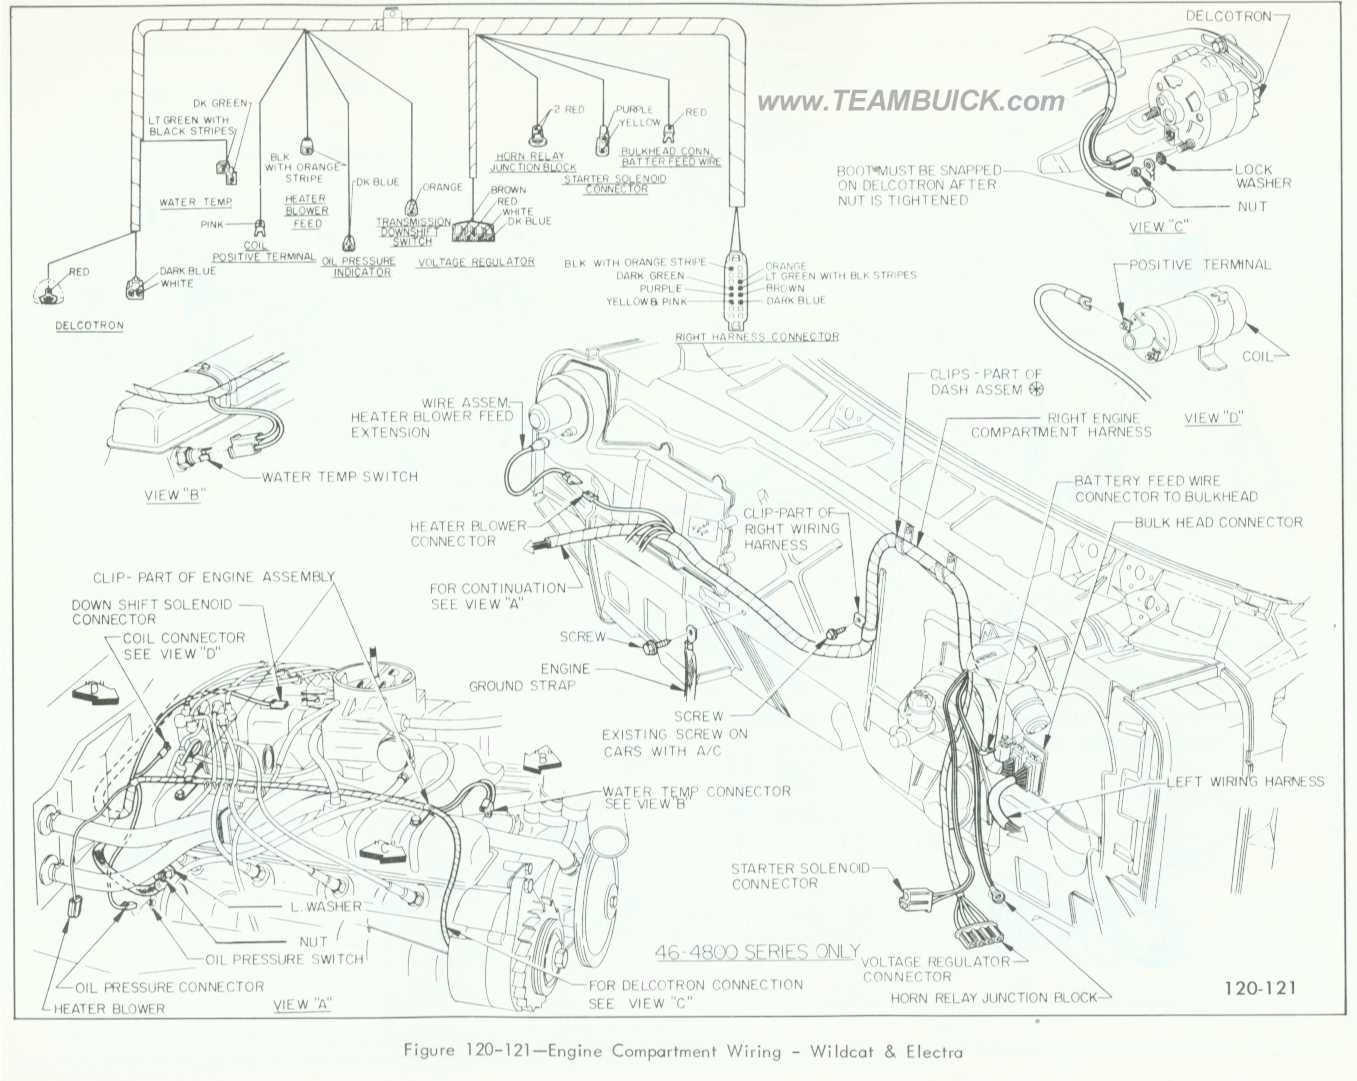 [CSDW_4250]   1966 Buick Wildcat, Electra, Engine Compartment Wiring | 1966 Buick Wildcat Wiring Diagram |  | Team Buick